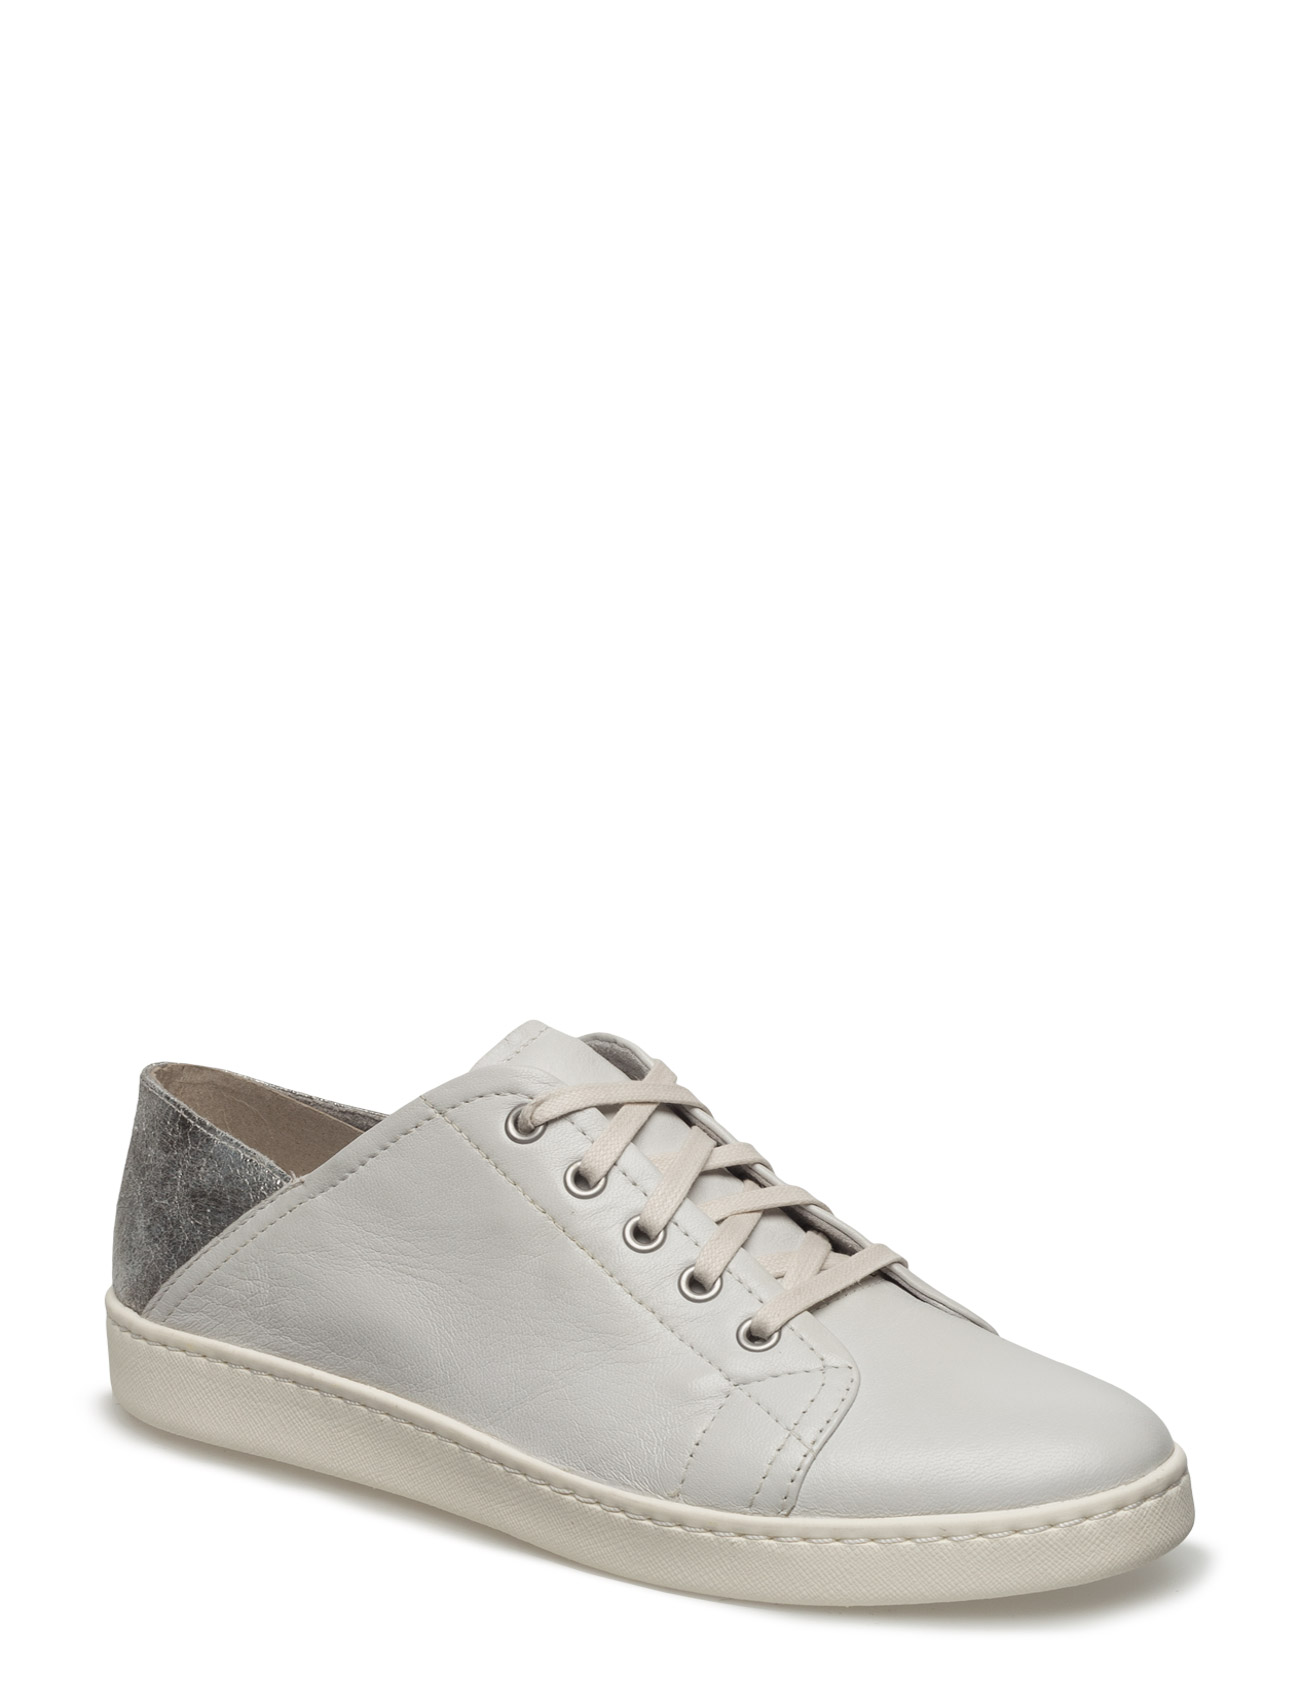 Woms Lace-Up Tamaris Sneakers til Damer i